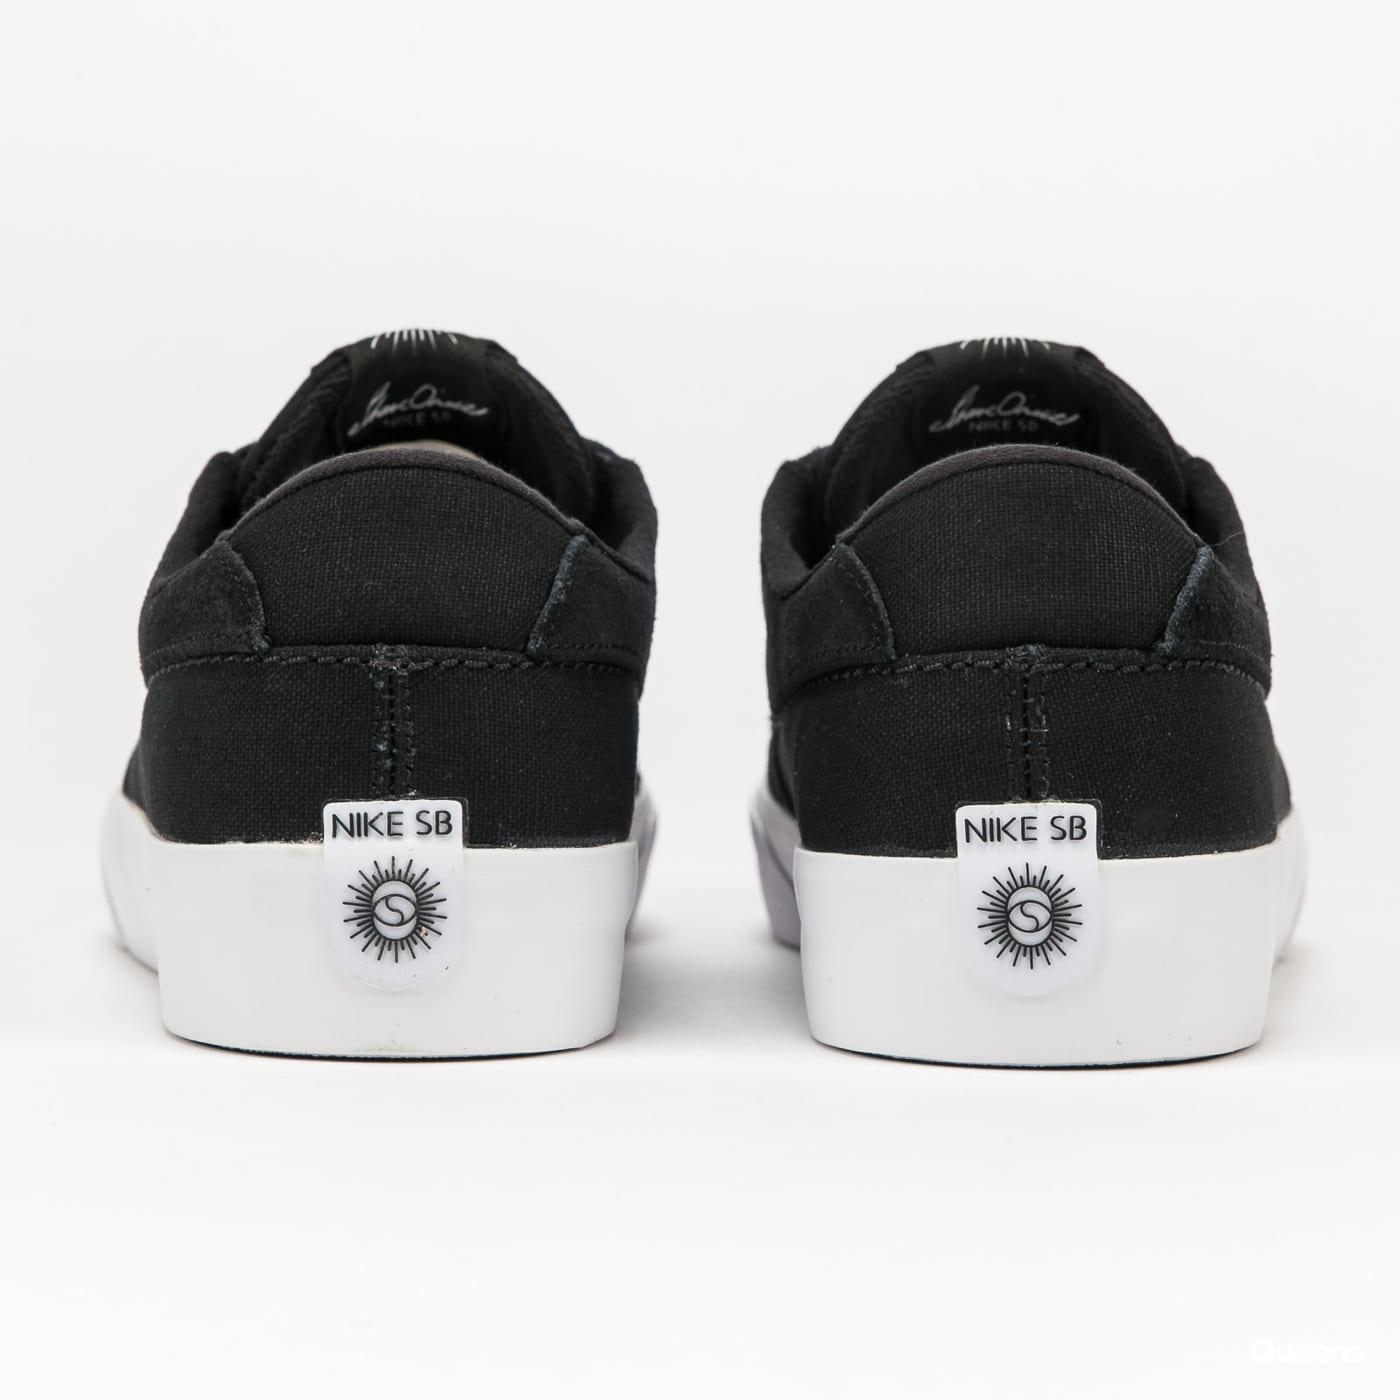 Nike SB Shane black / white - black